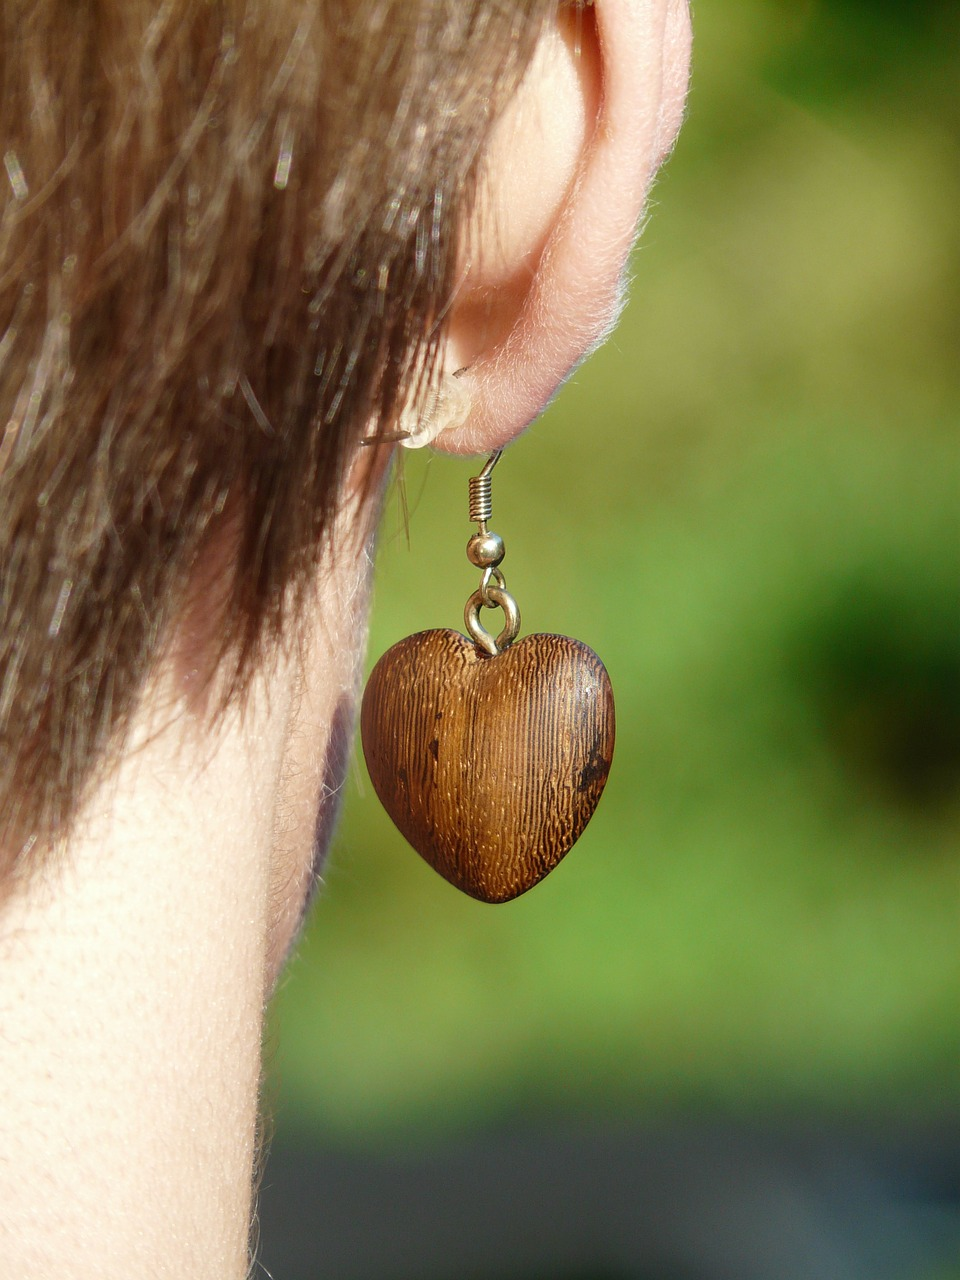 Heart of Hearing